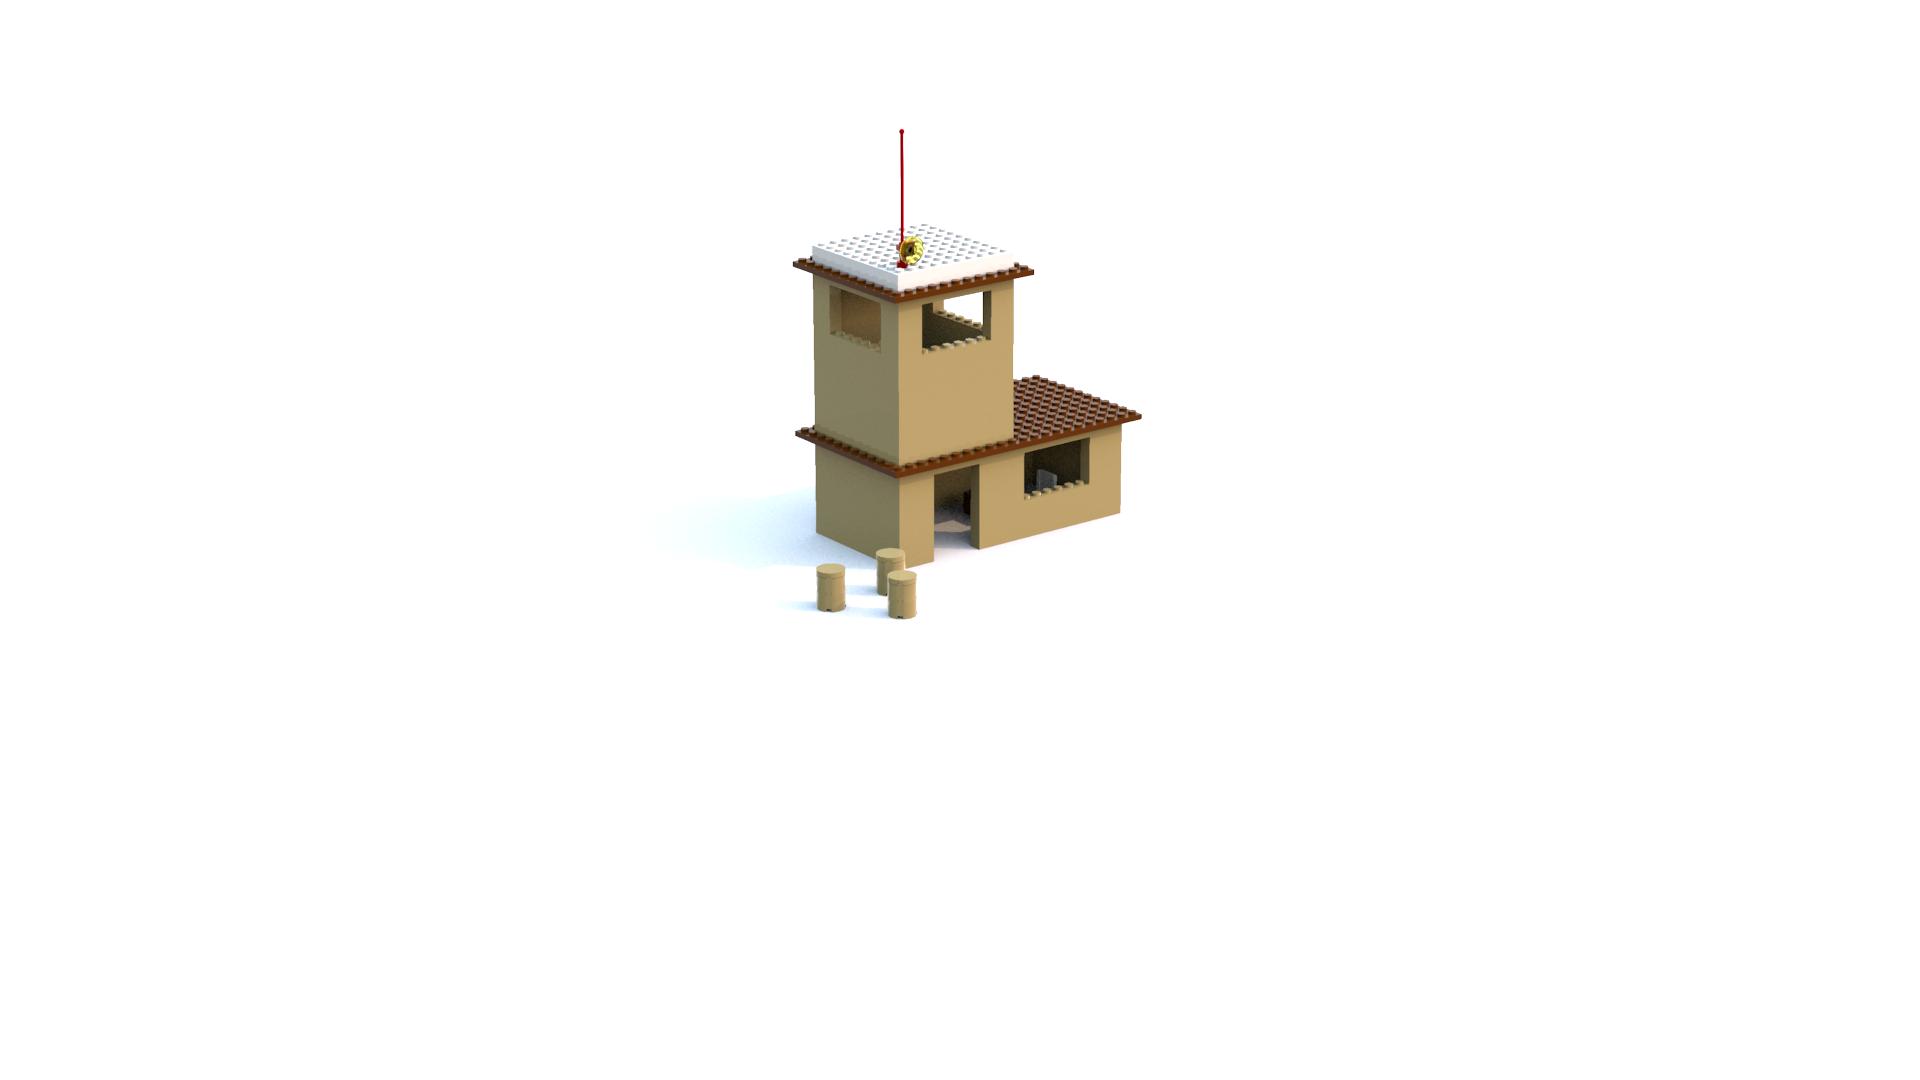 Lego Island 2 Adventurer's Island Helicopter Control Tower LDD Model